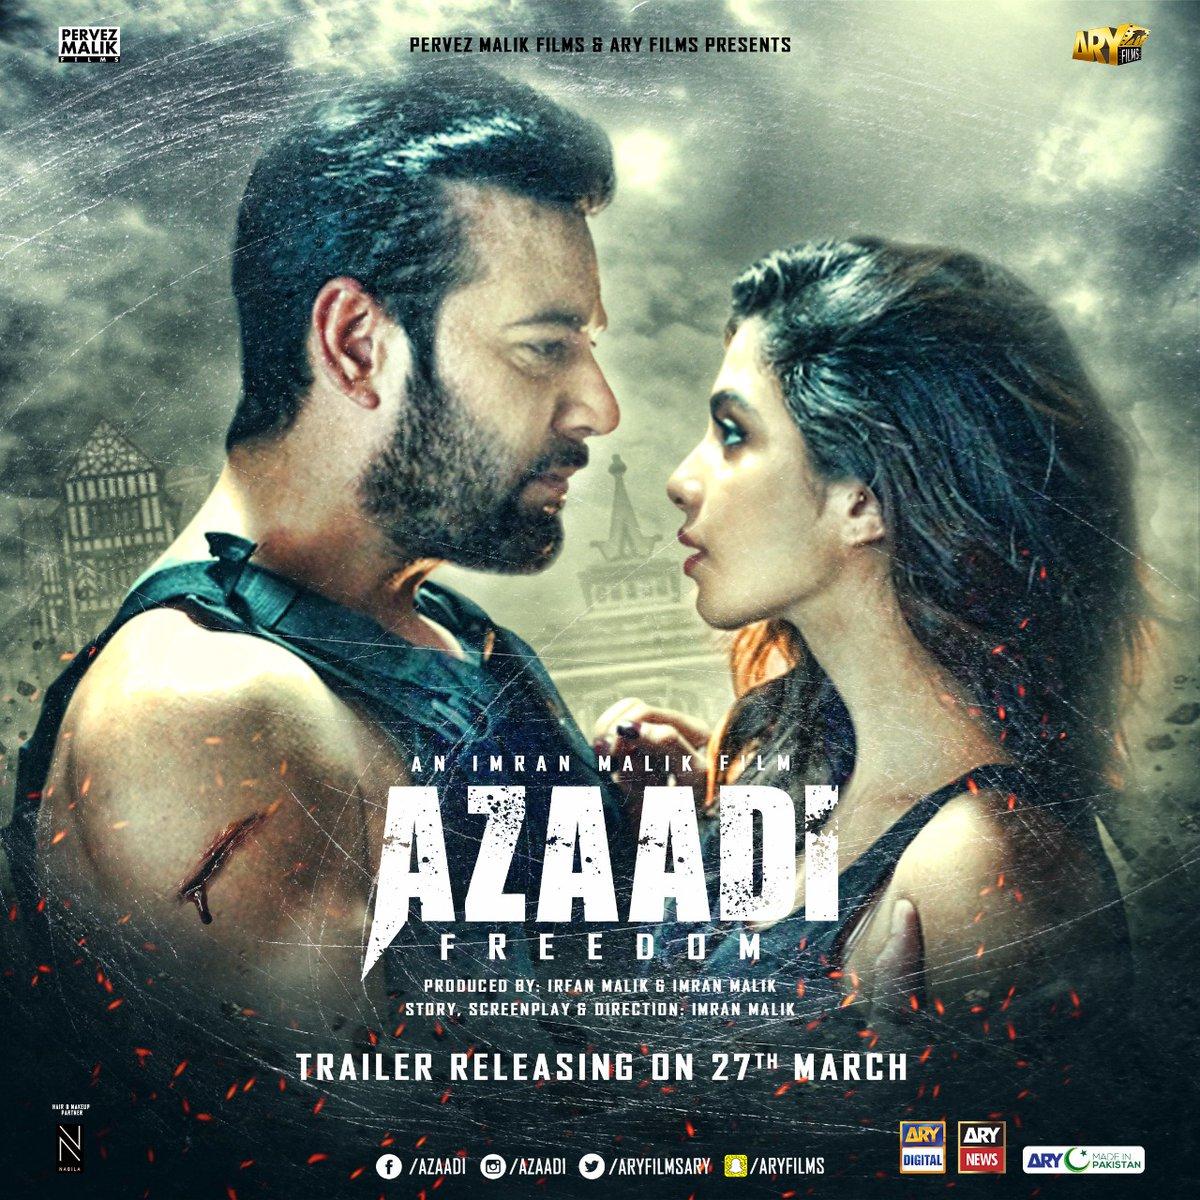 Azaadi Trailer review mediamagick com2